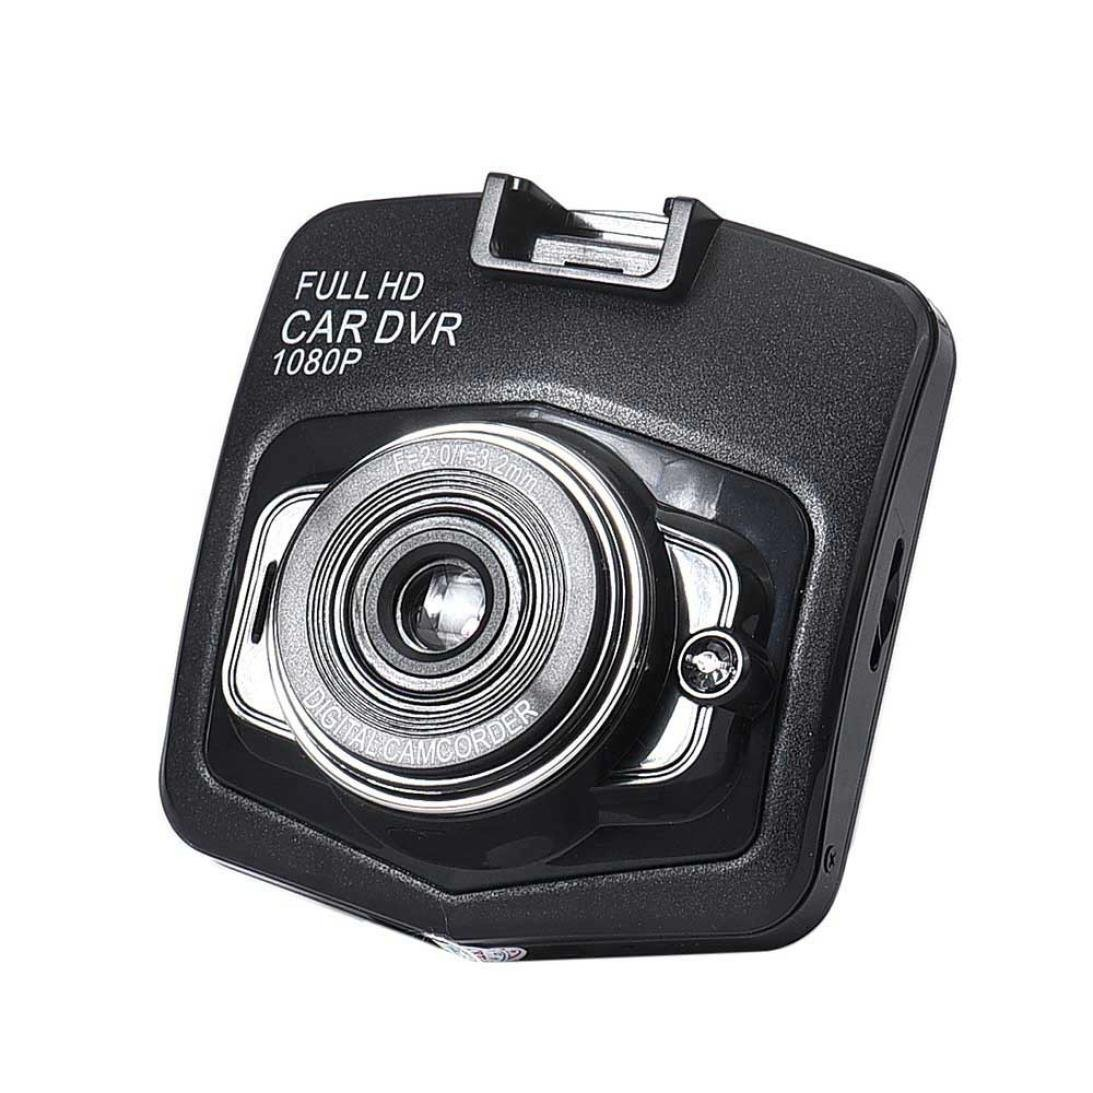 OVERMAL 2.4'' Full HD 1080P Car DVR Vehicle Camera Video Recorder Dash Cam G-sensor